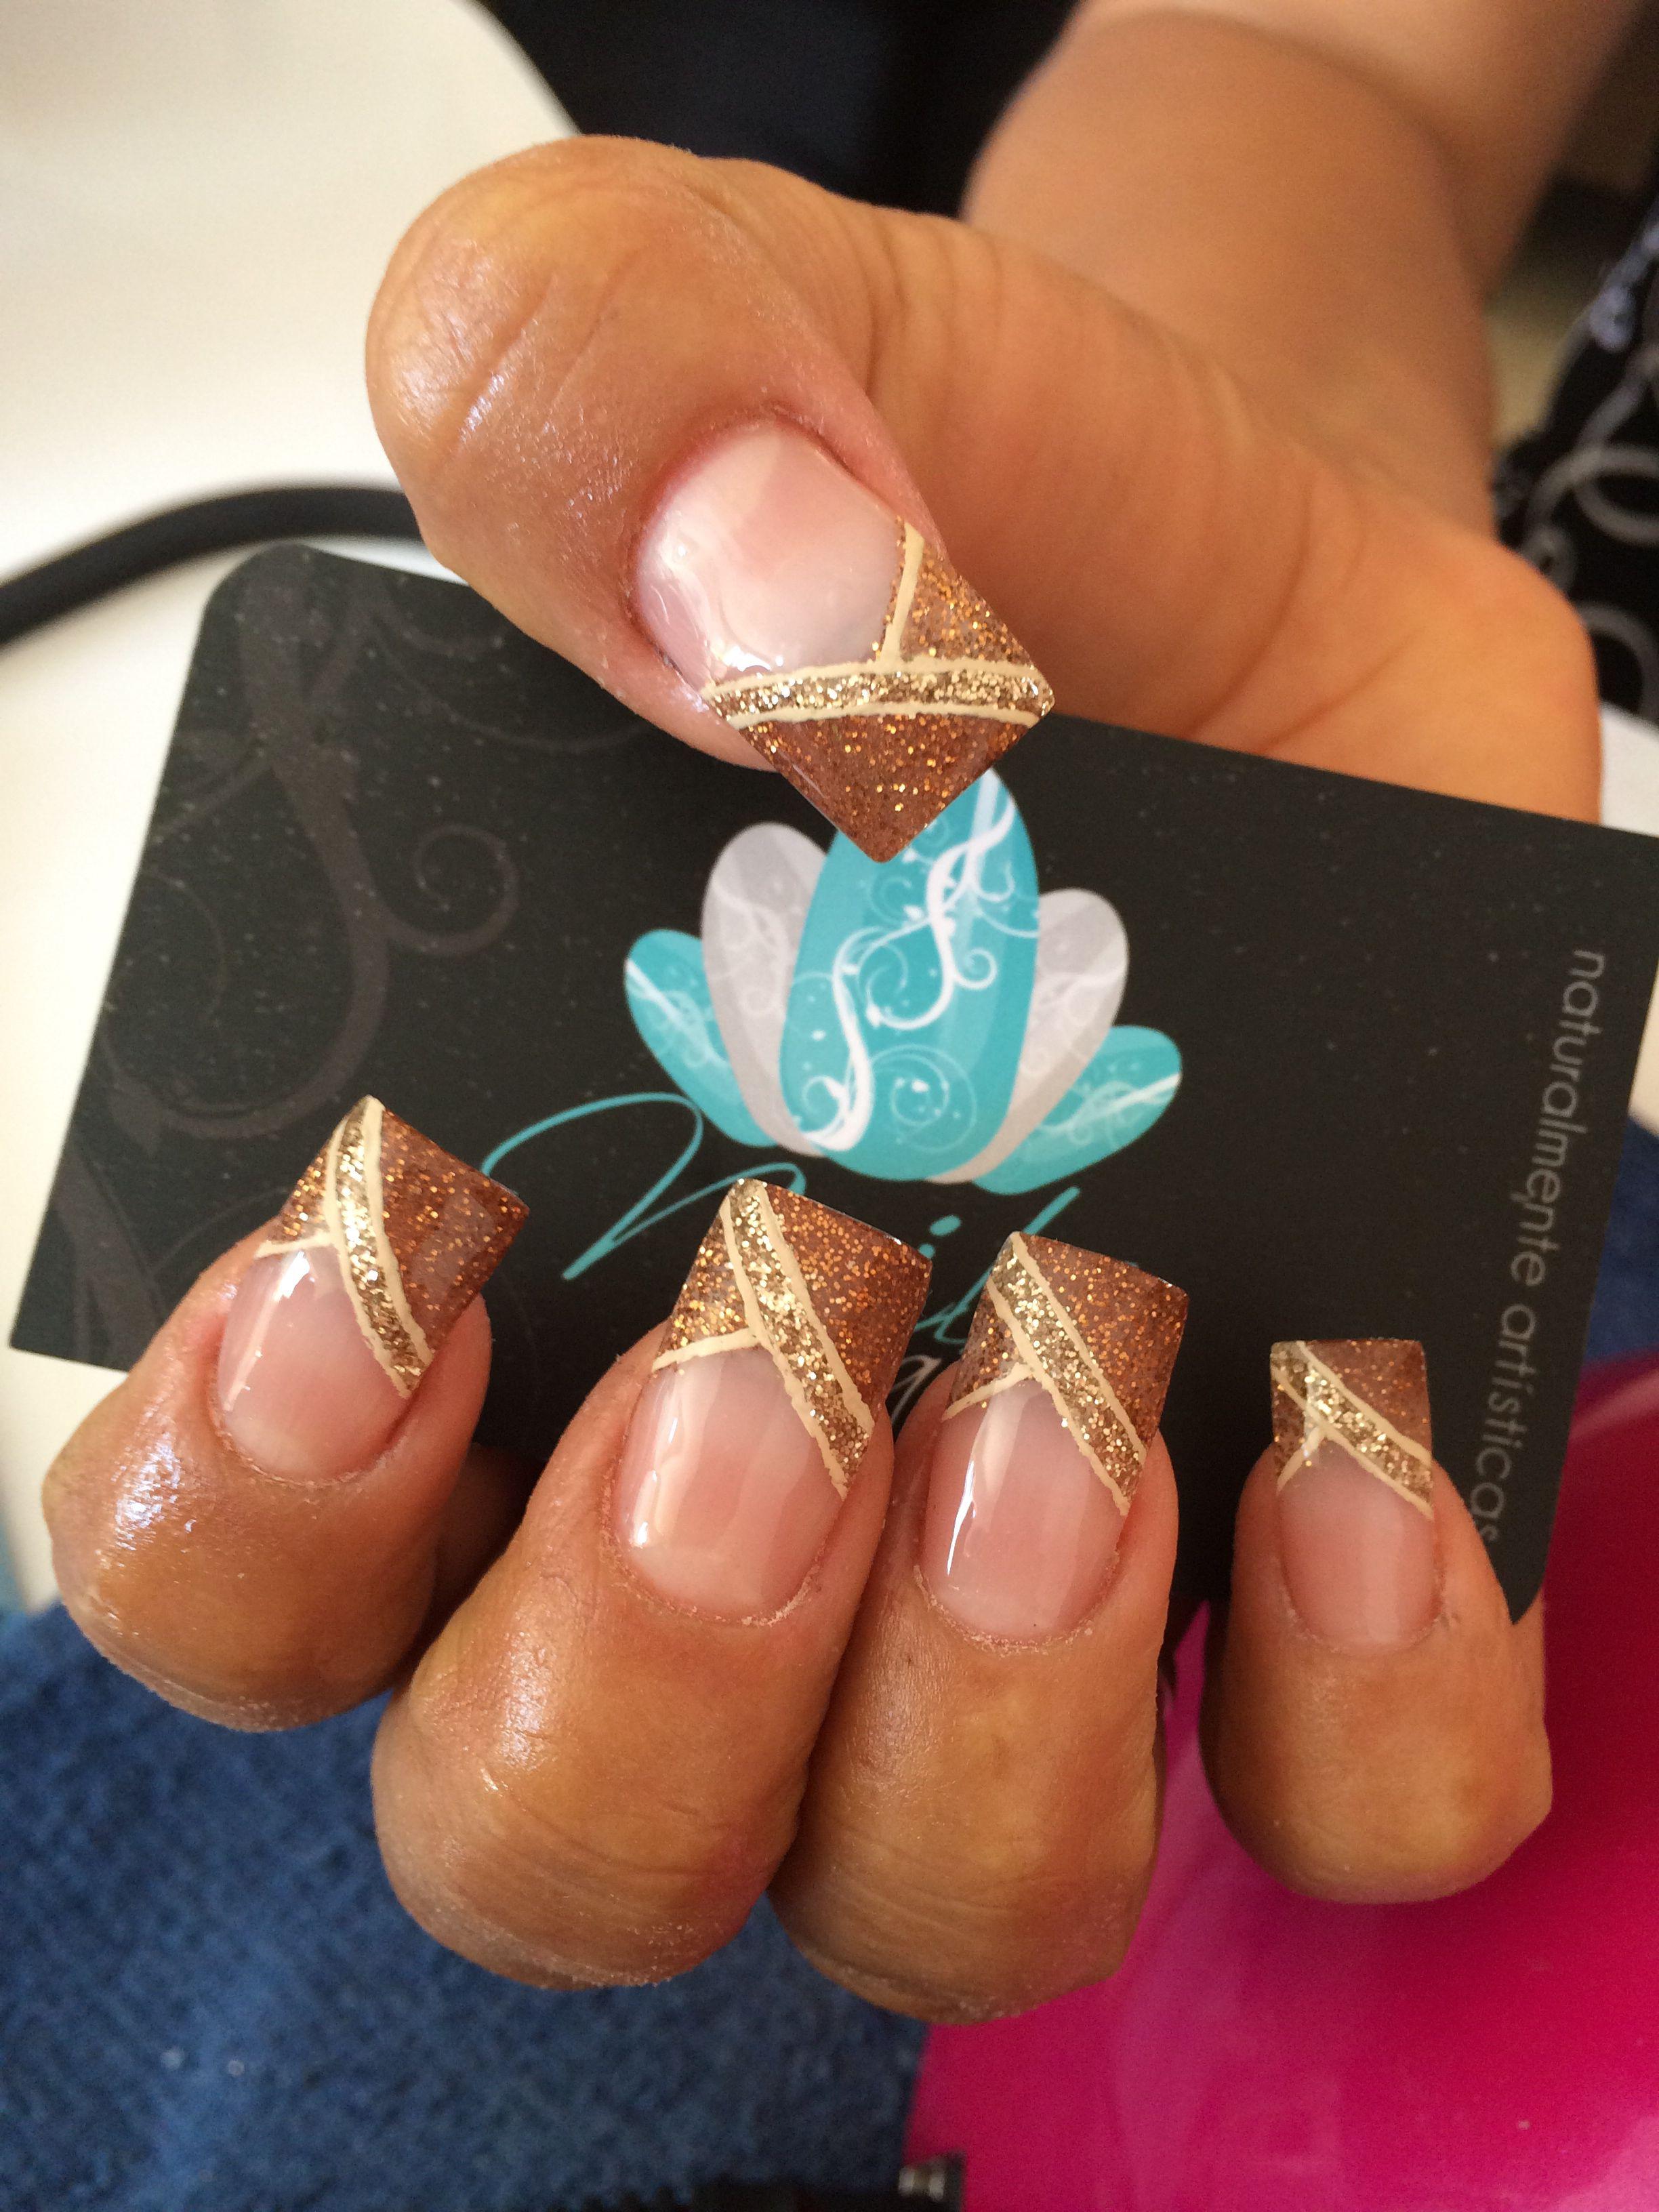 Nails art, acrylic nails, nails | design nägel | Pinterest ...